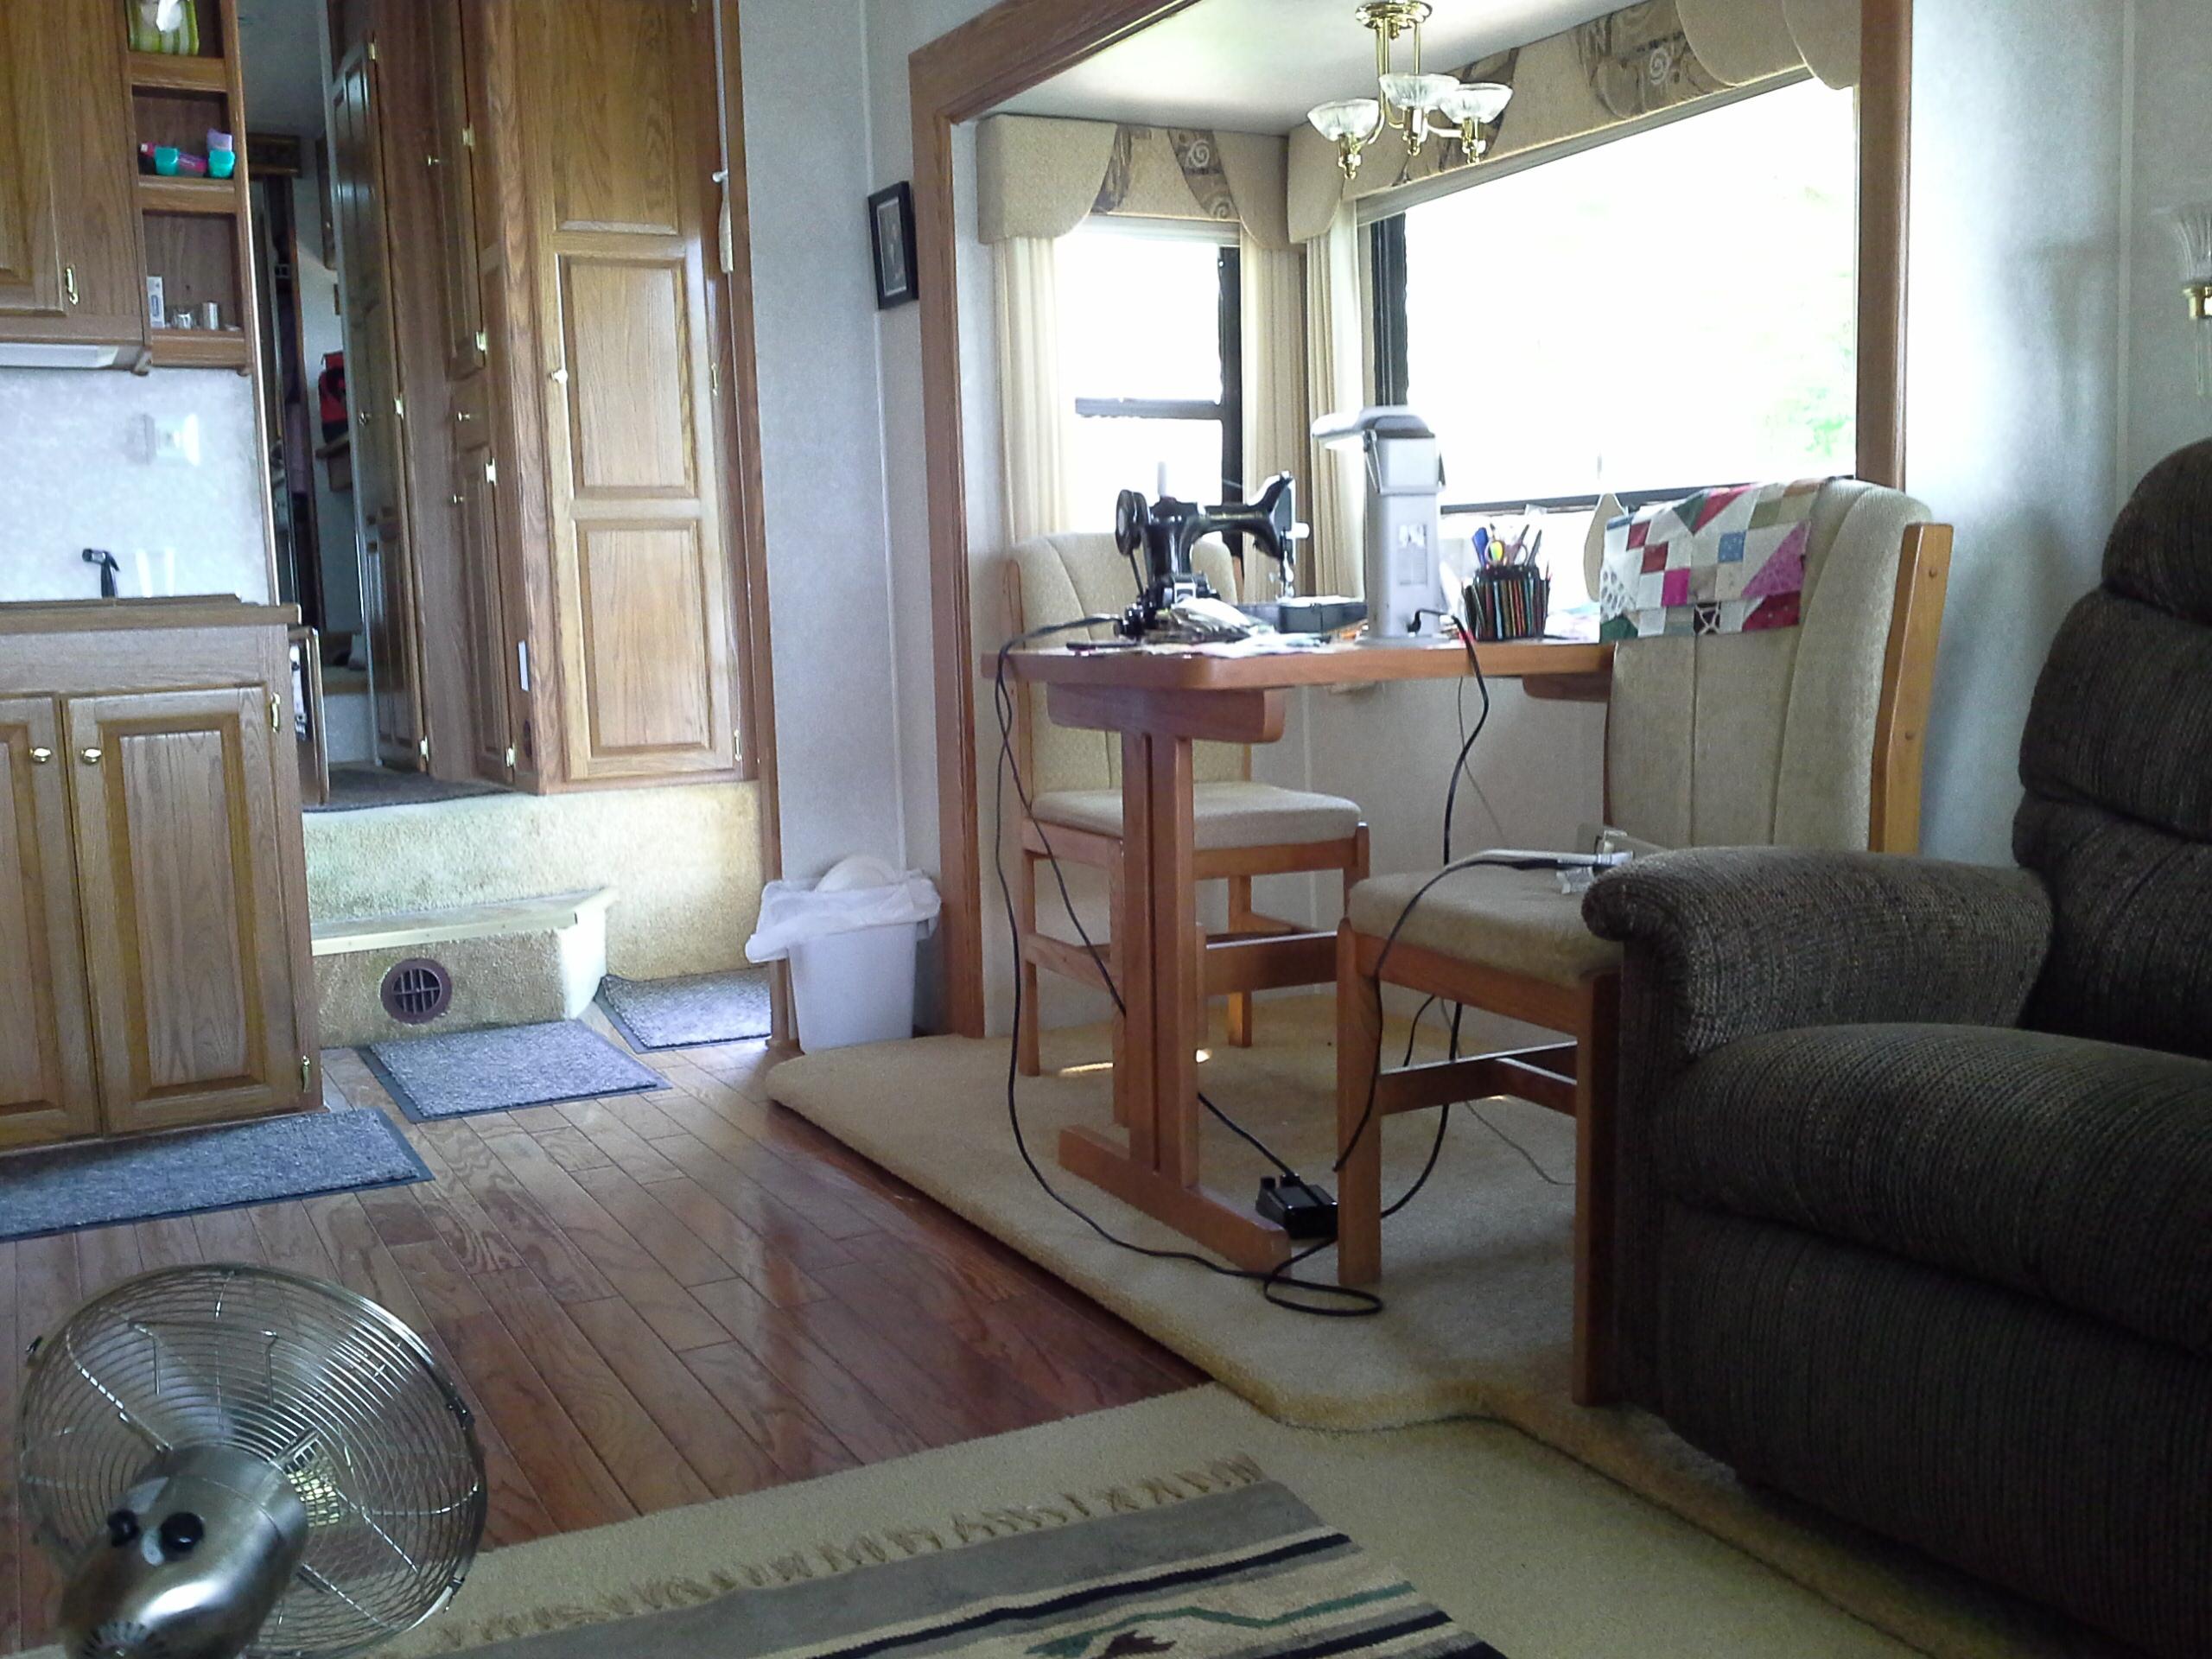 Sewing room in camper